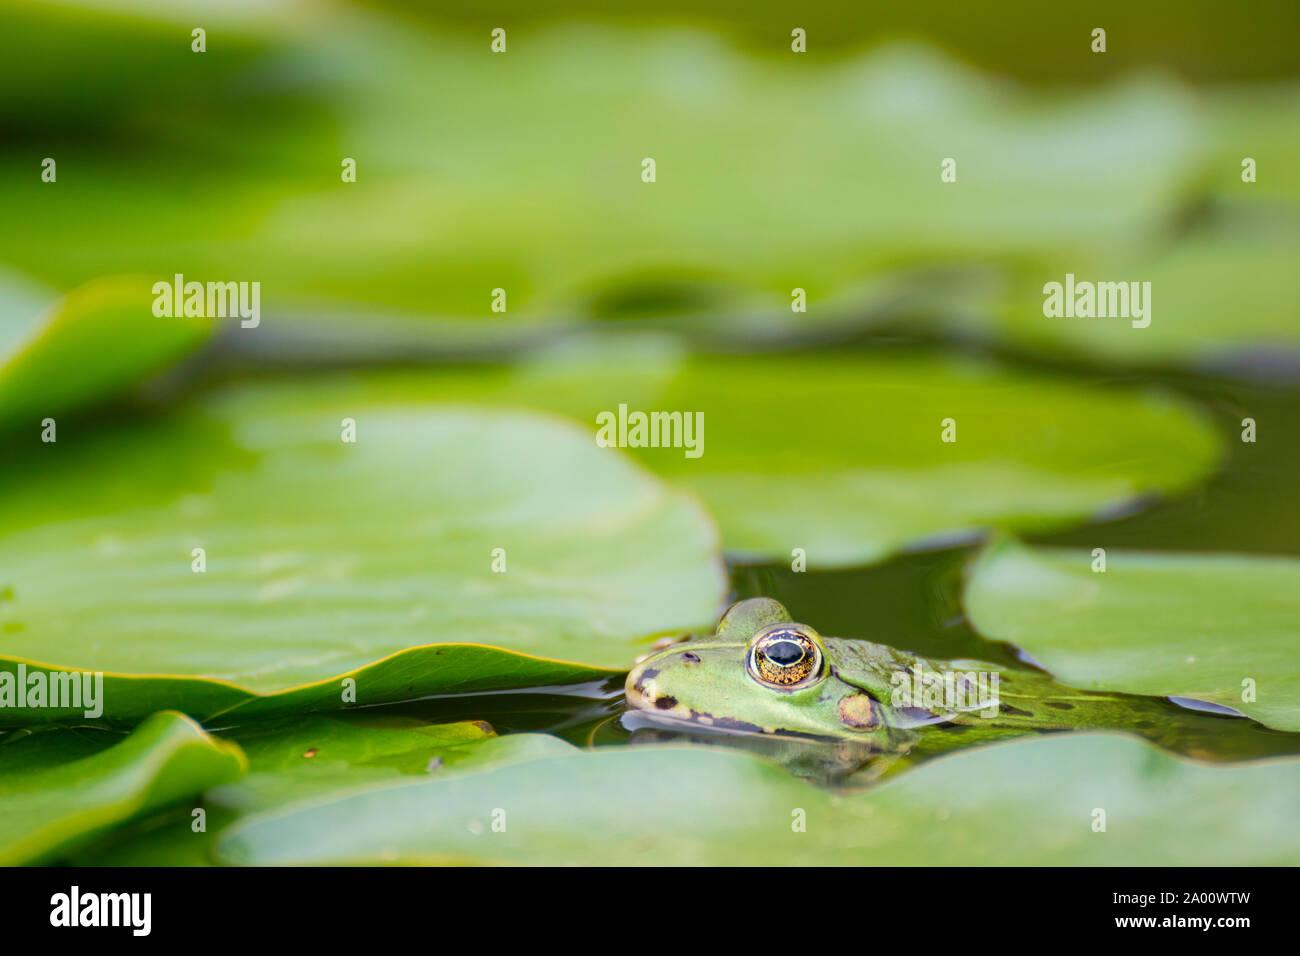 Green frog, Common water frog, Zingst, Mecklenburg-Vorpommern, Germany, (Pelophylax kl. esculentus) Stock Photo